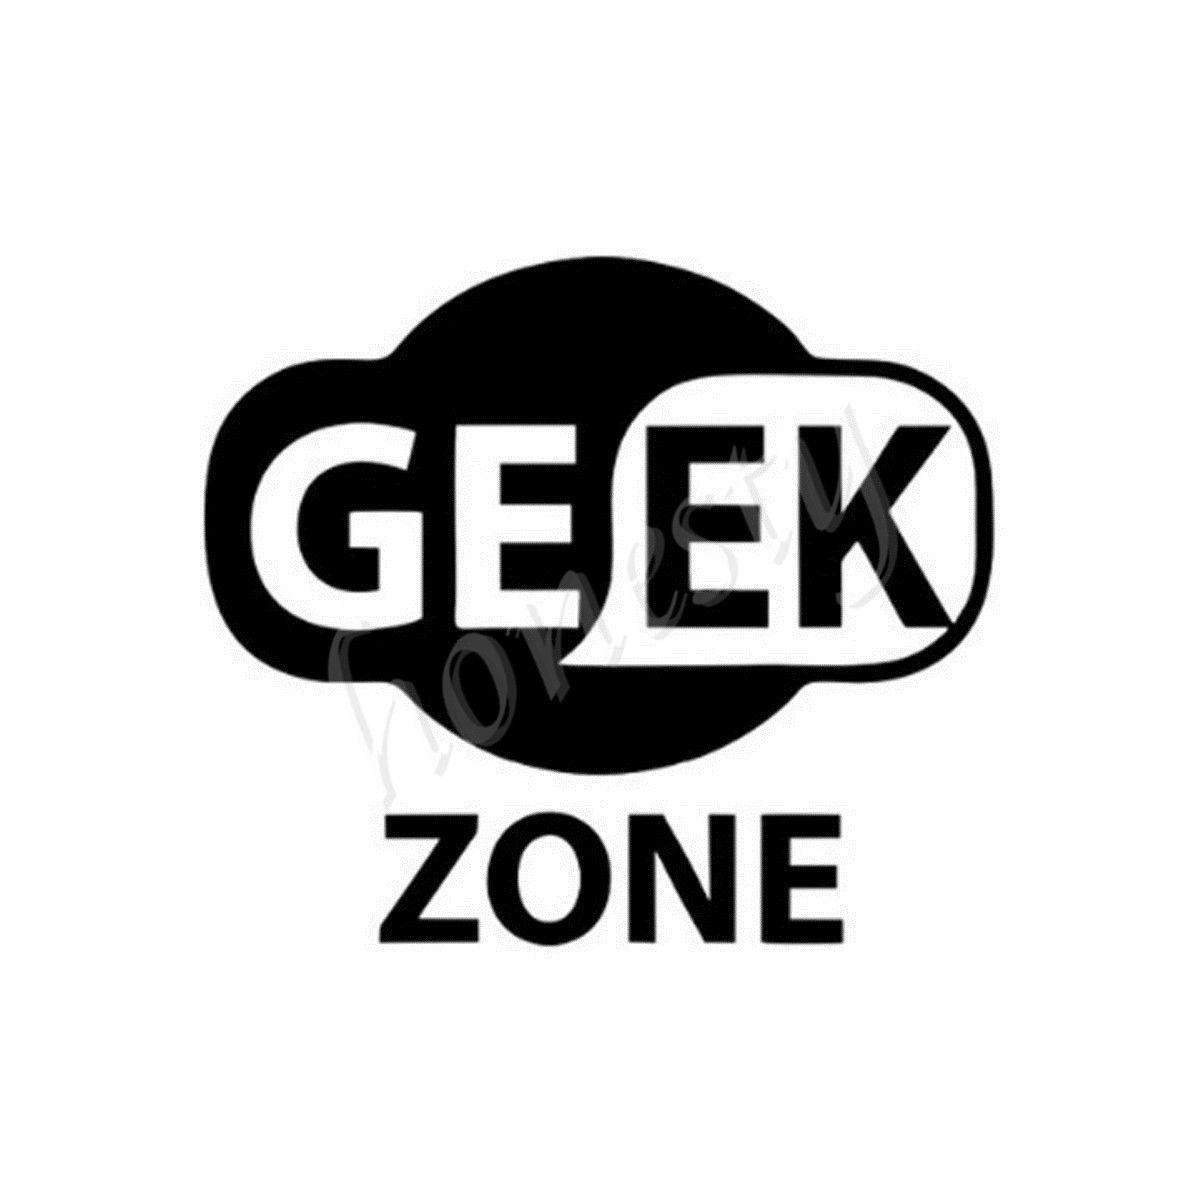 Car glass sticker design - Geek Zone Design Wall Home Door Window Glass Car Sticker Laptop Auto Truck Black Vinyl Decal